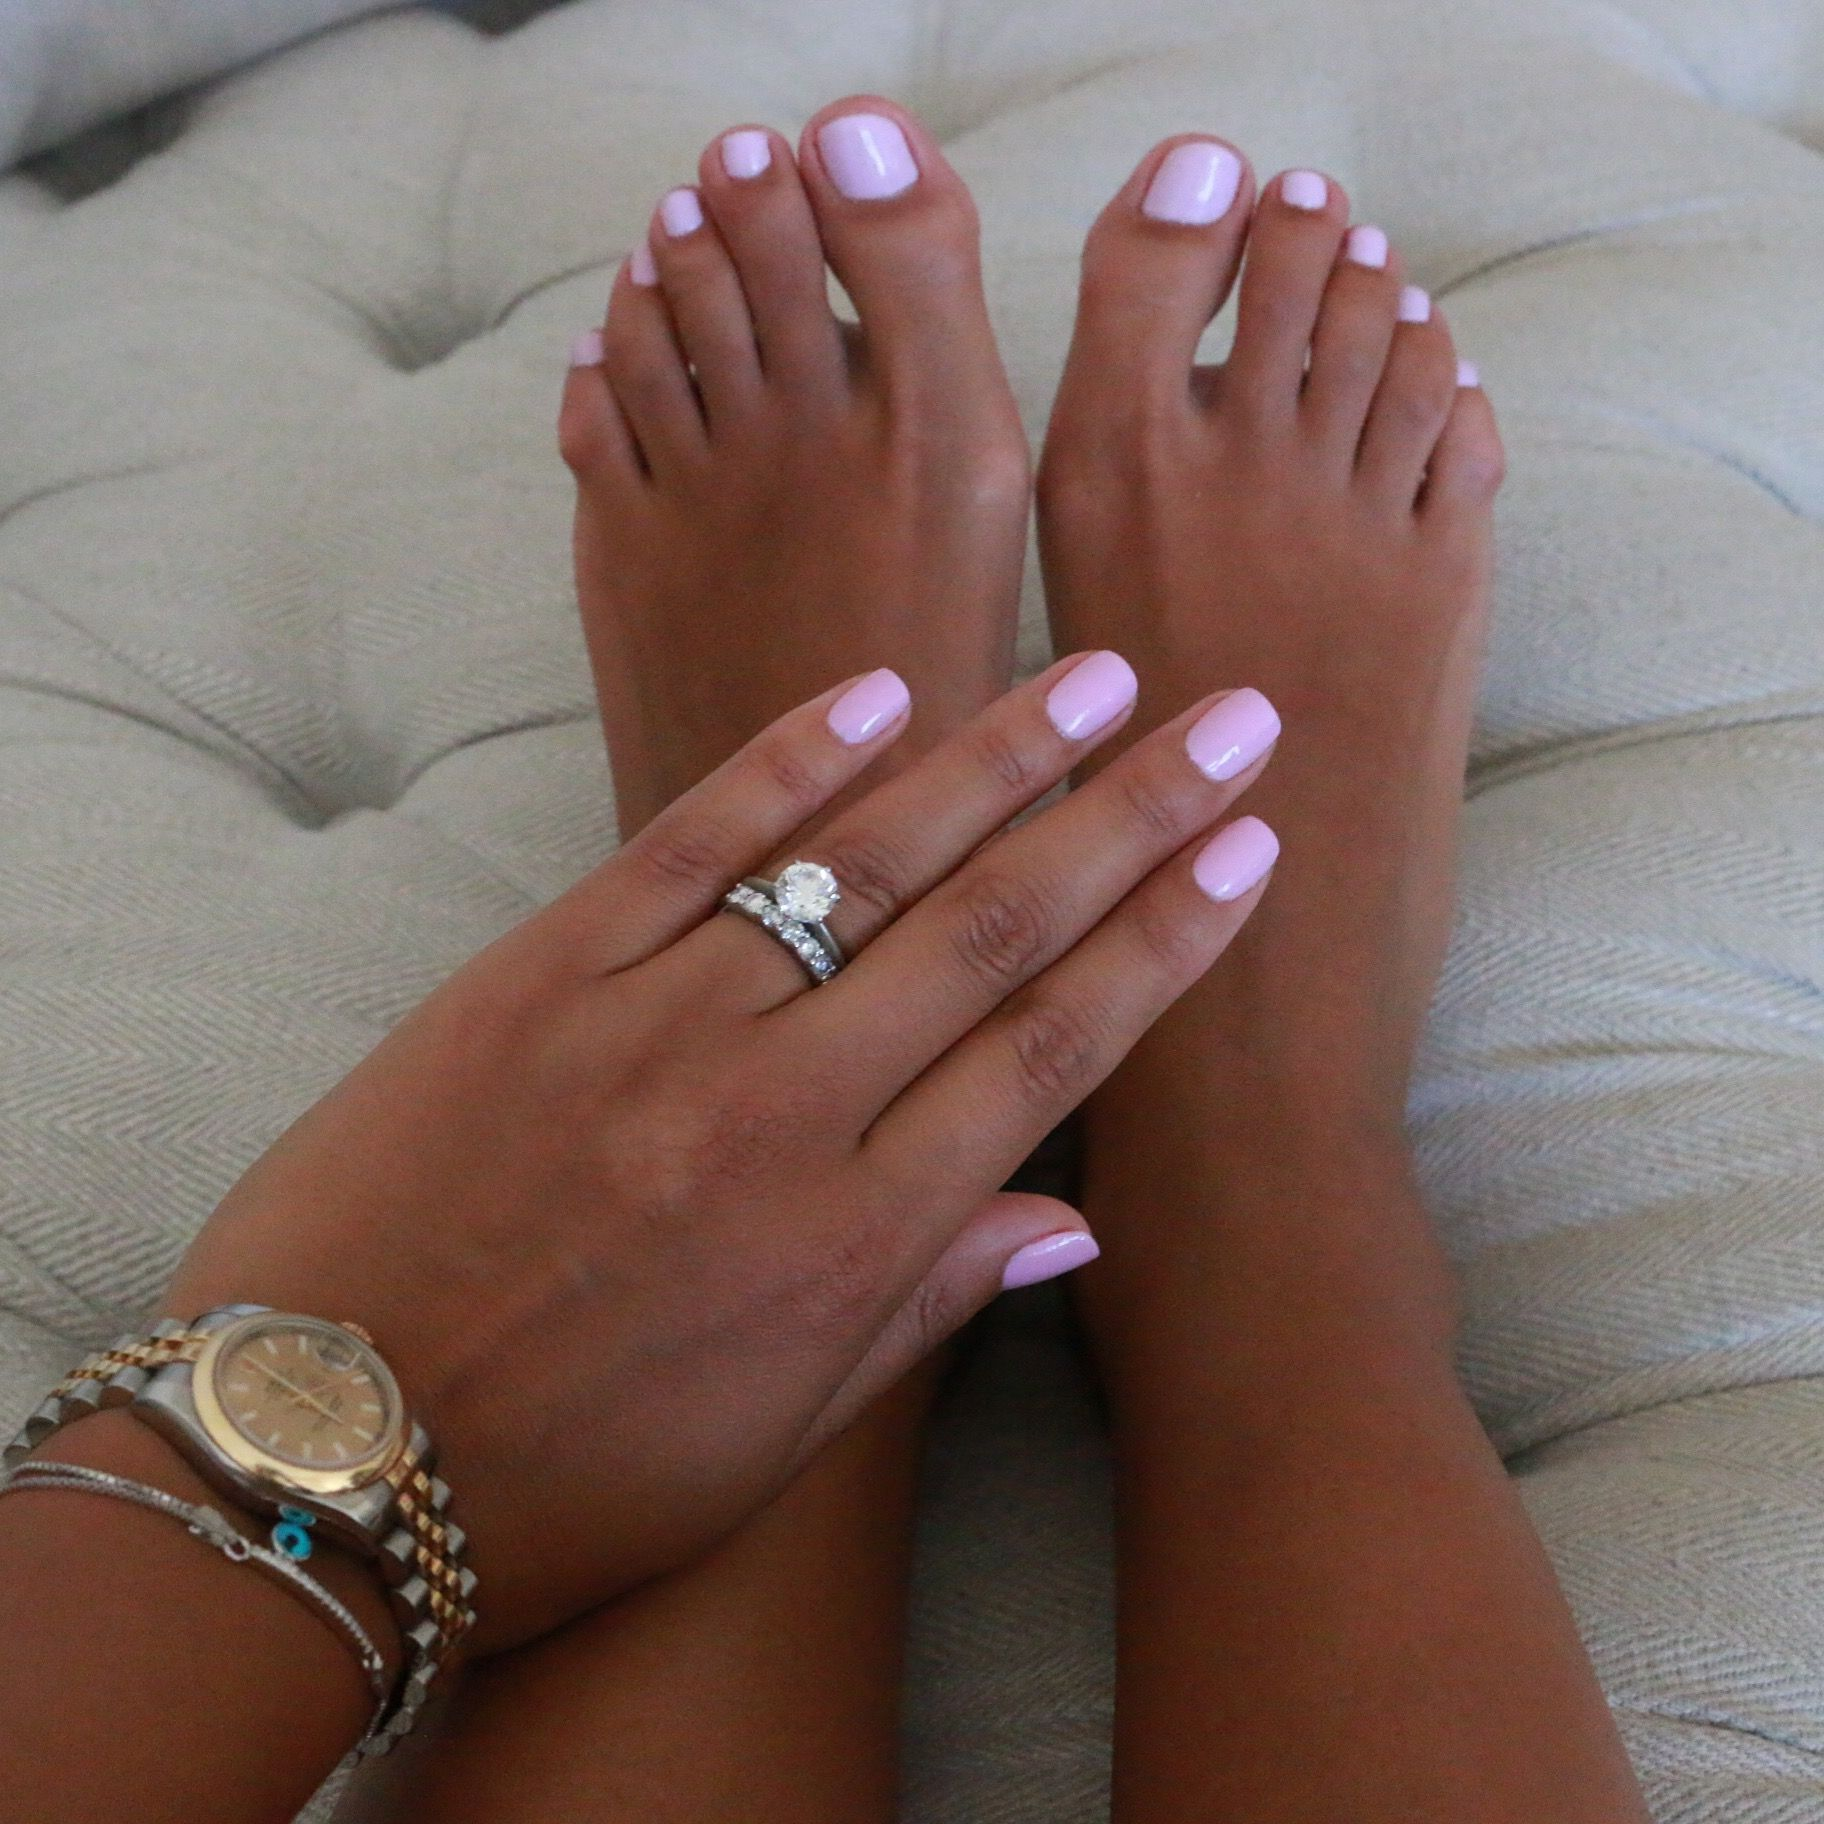 Pin By Michelle Ashley On Nails Pink Toe Nails Summer Toe Nails Light Pink Nails